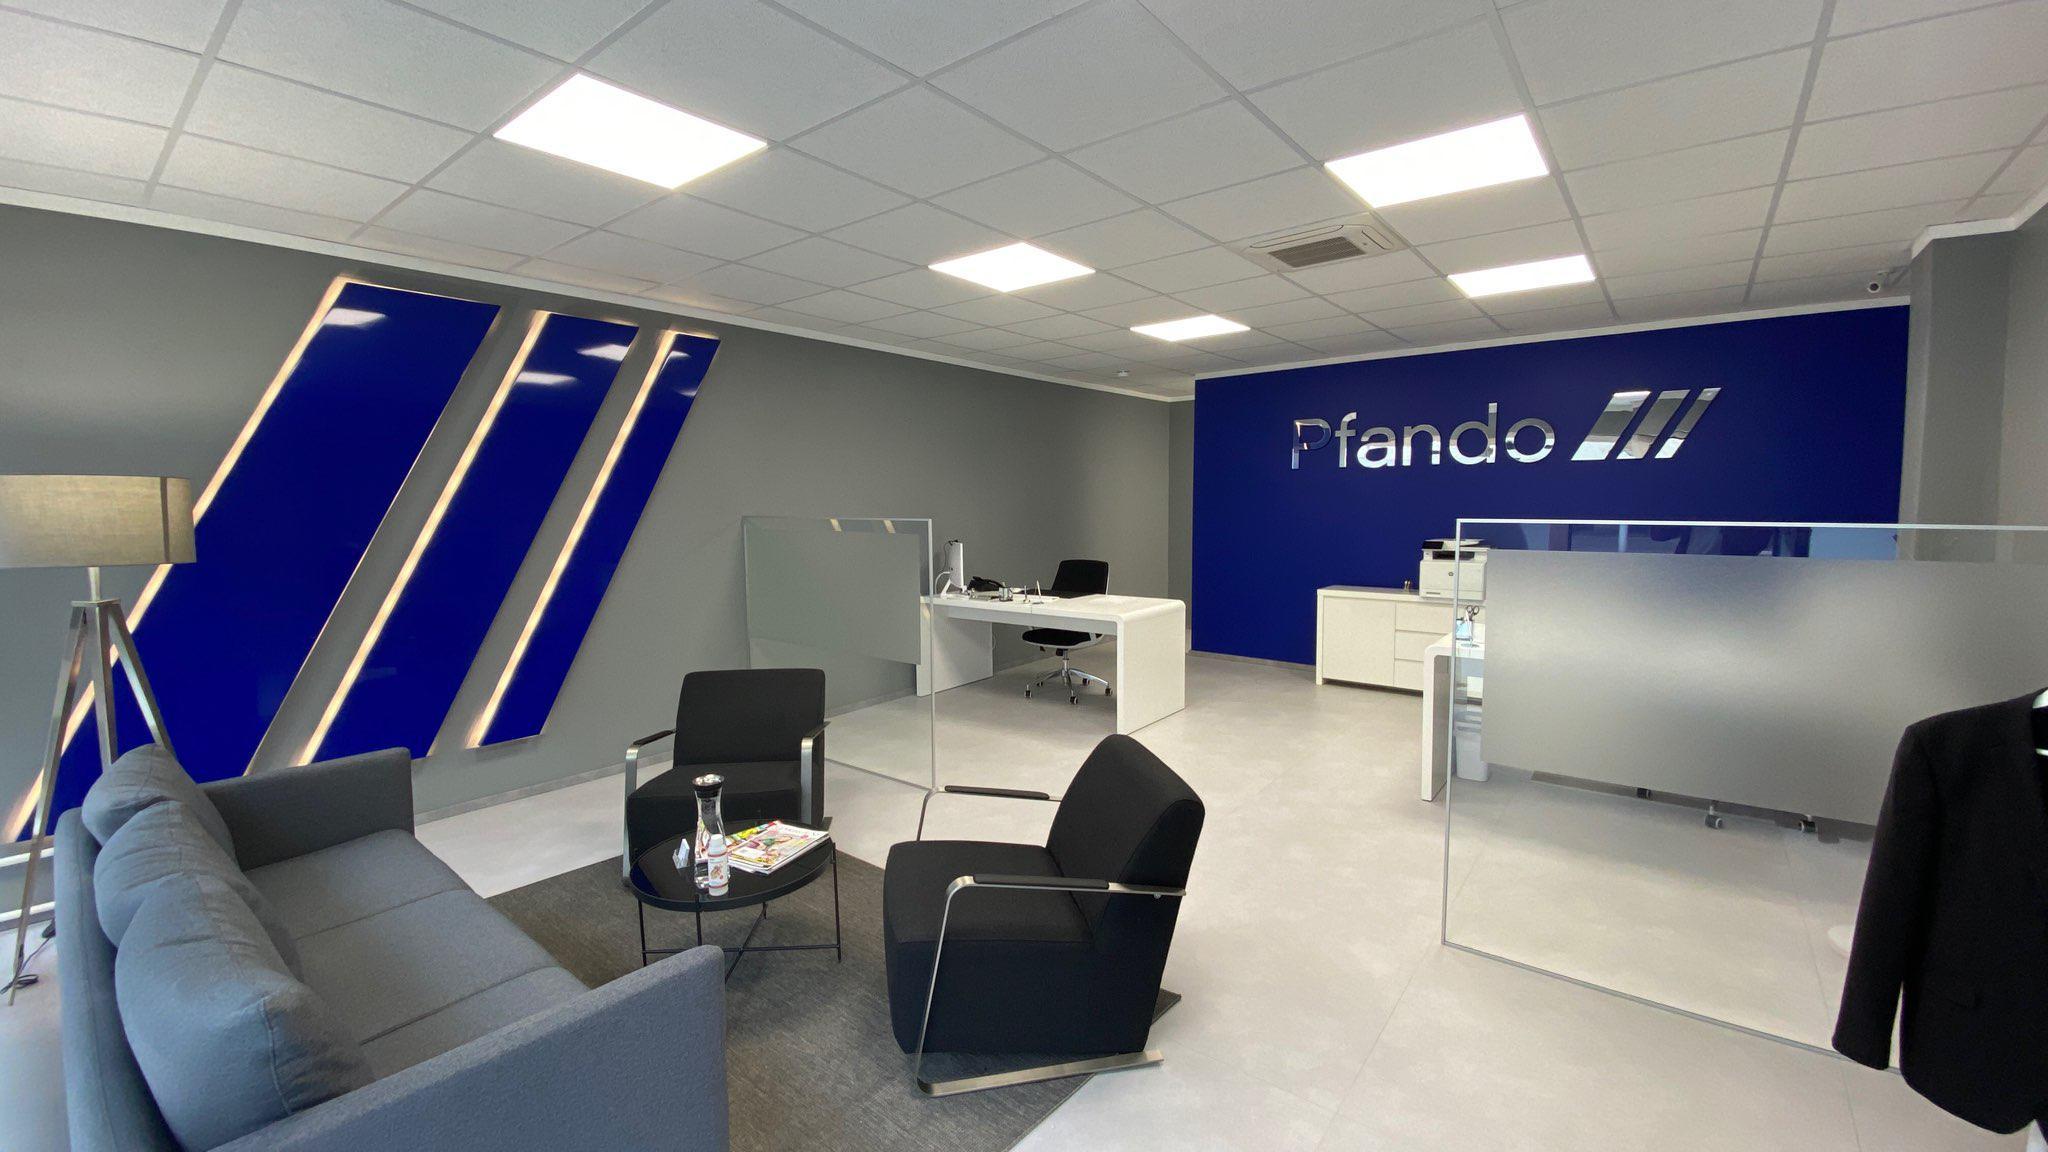 Pfando - Kfz-Pfandleihhaus Hannover